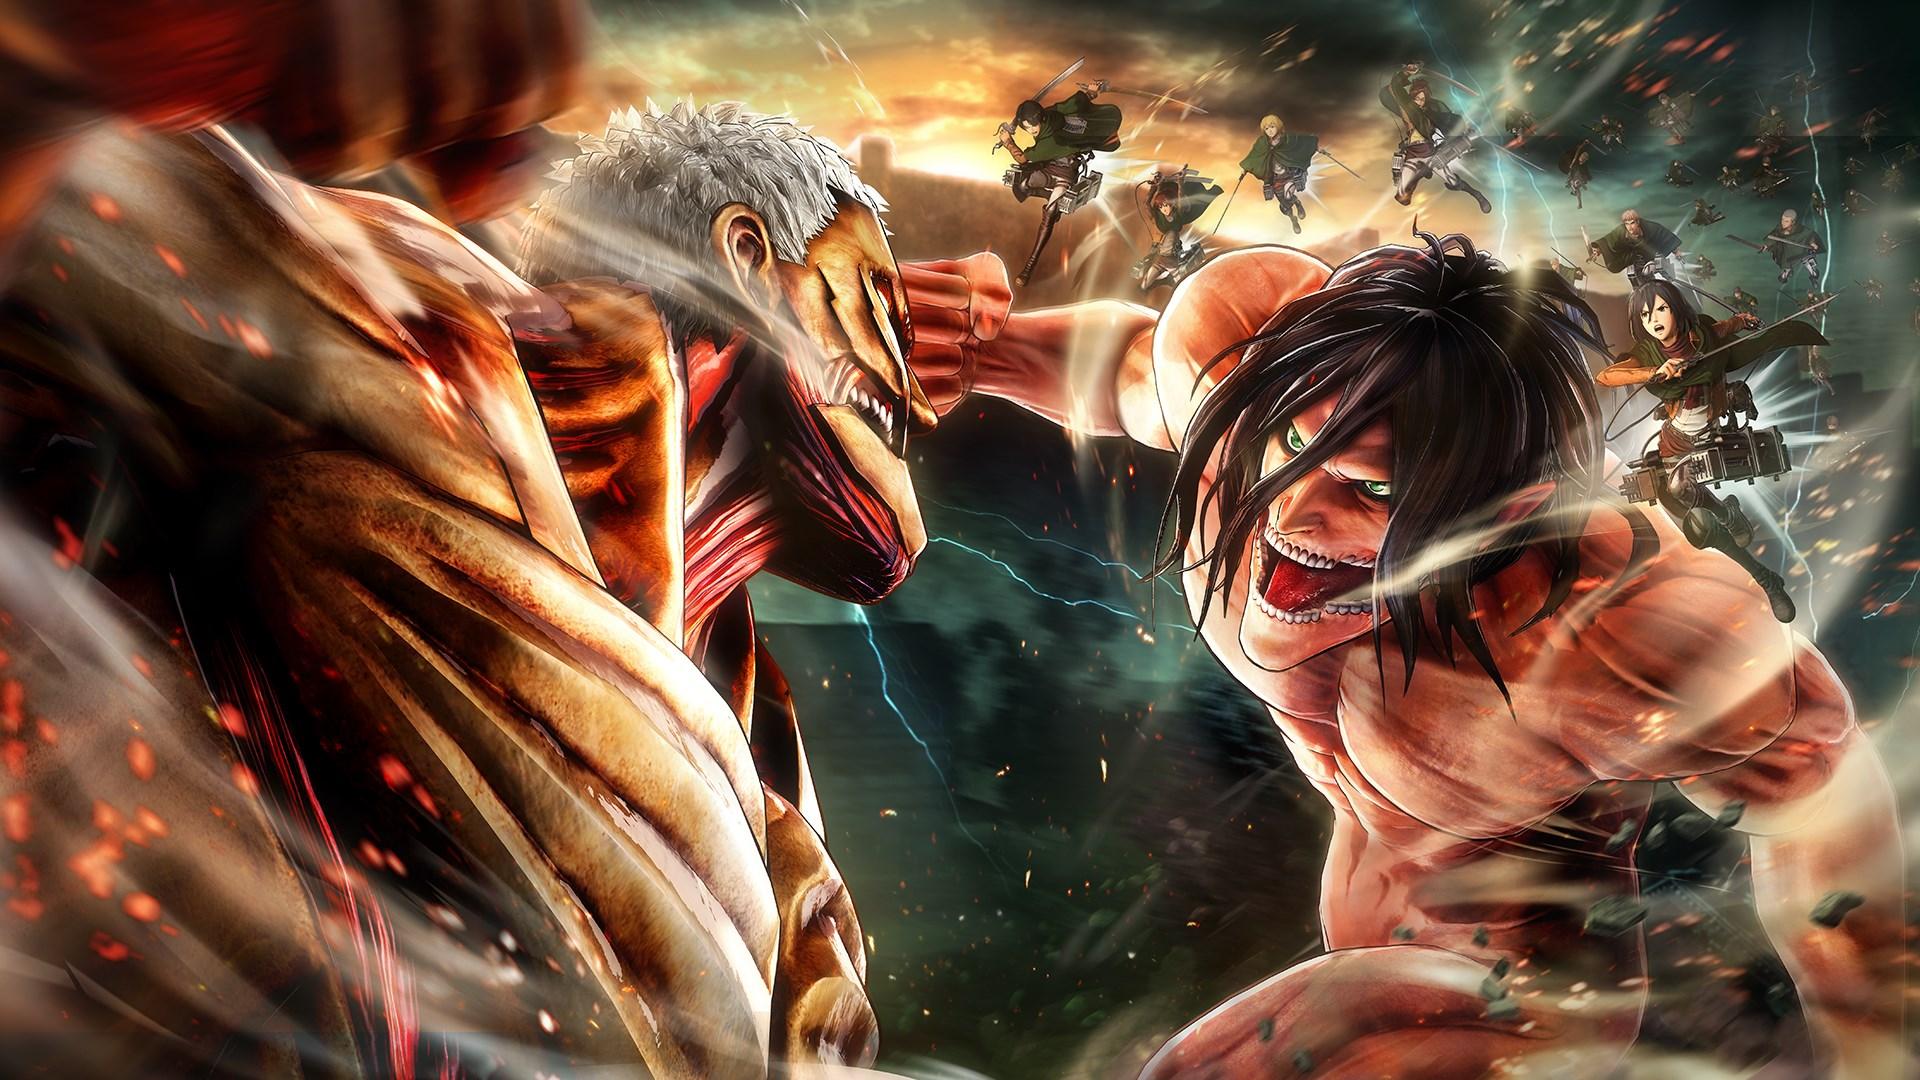 En iyi anime diziler Attack on Titan